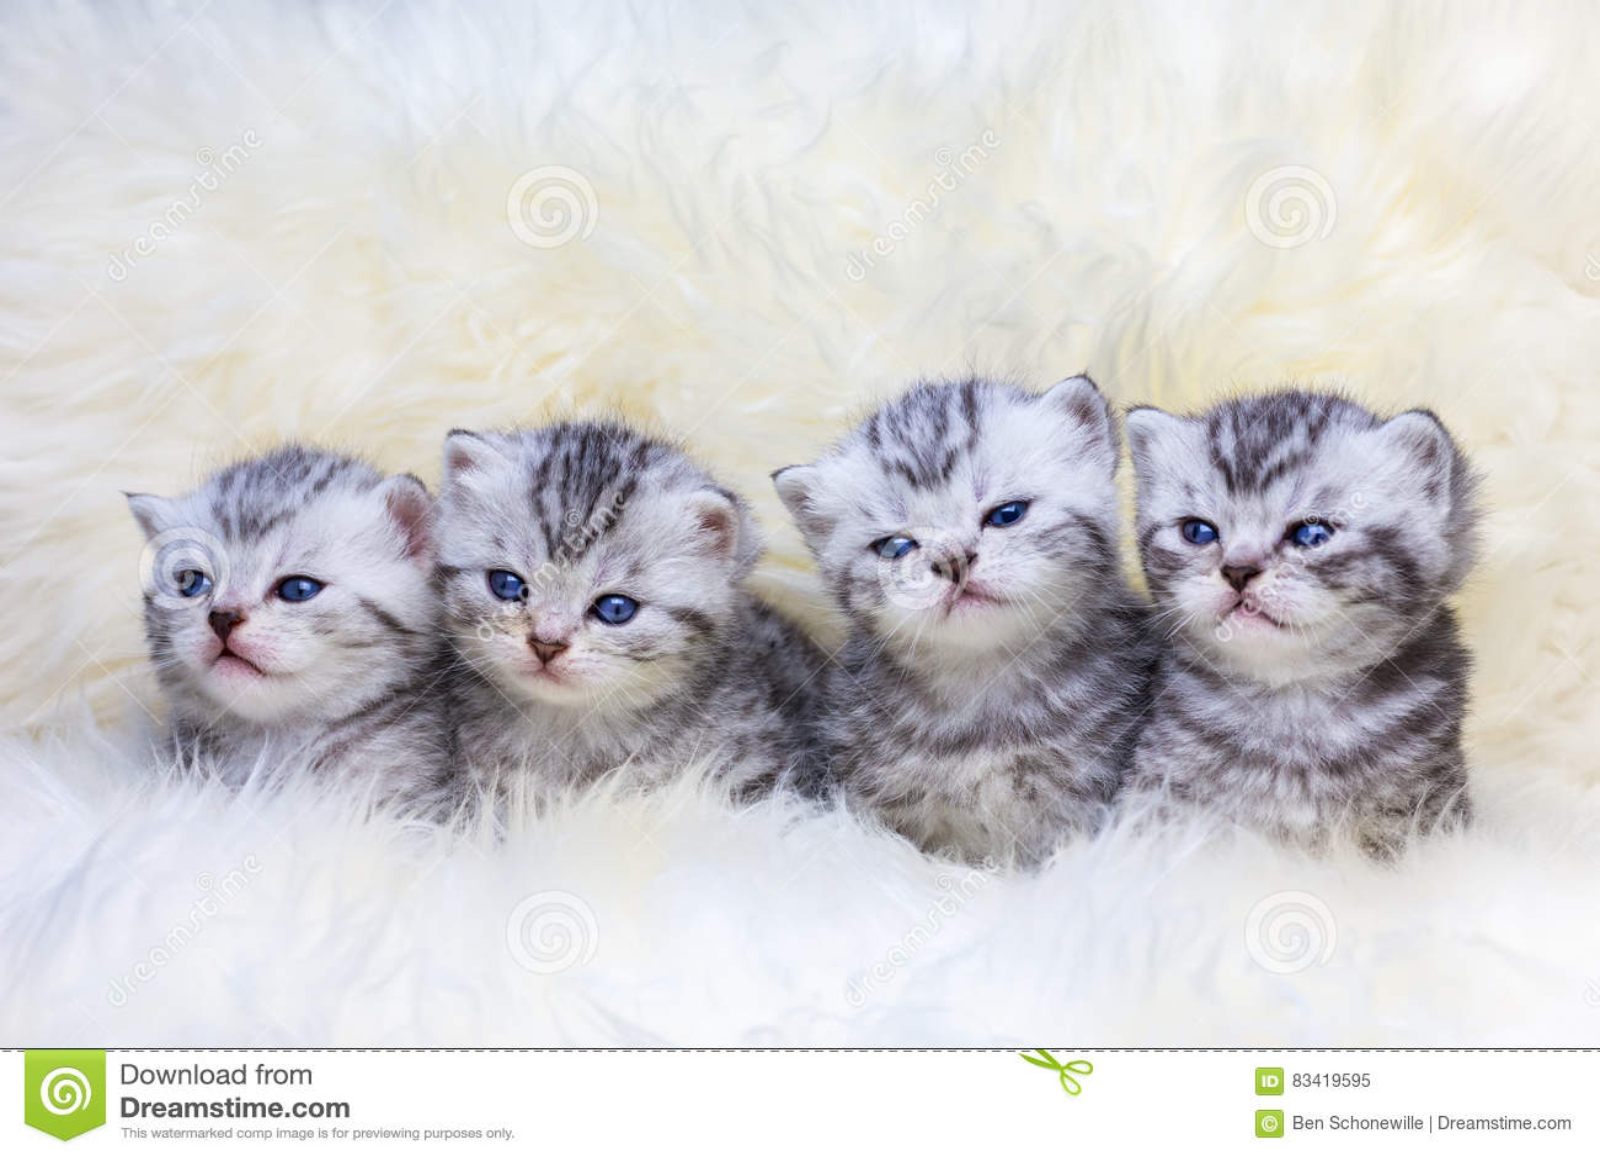 54e3640eb0c8 Φωλιά με τέσσερις νέες τιγρέ γάτες σε μια σειρά Στοκ Εικόνα - εικόνα ...